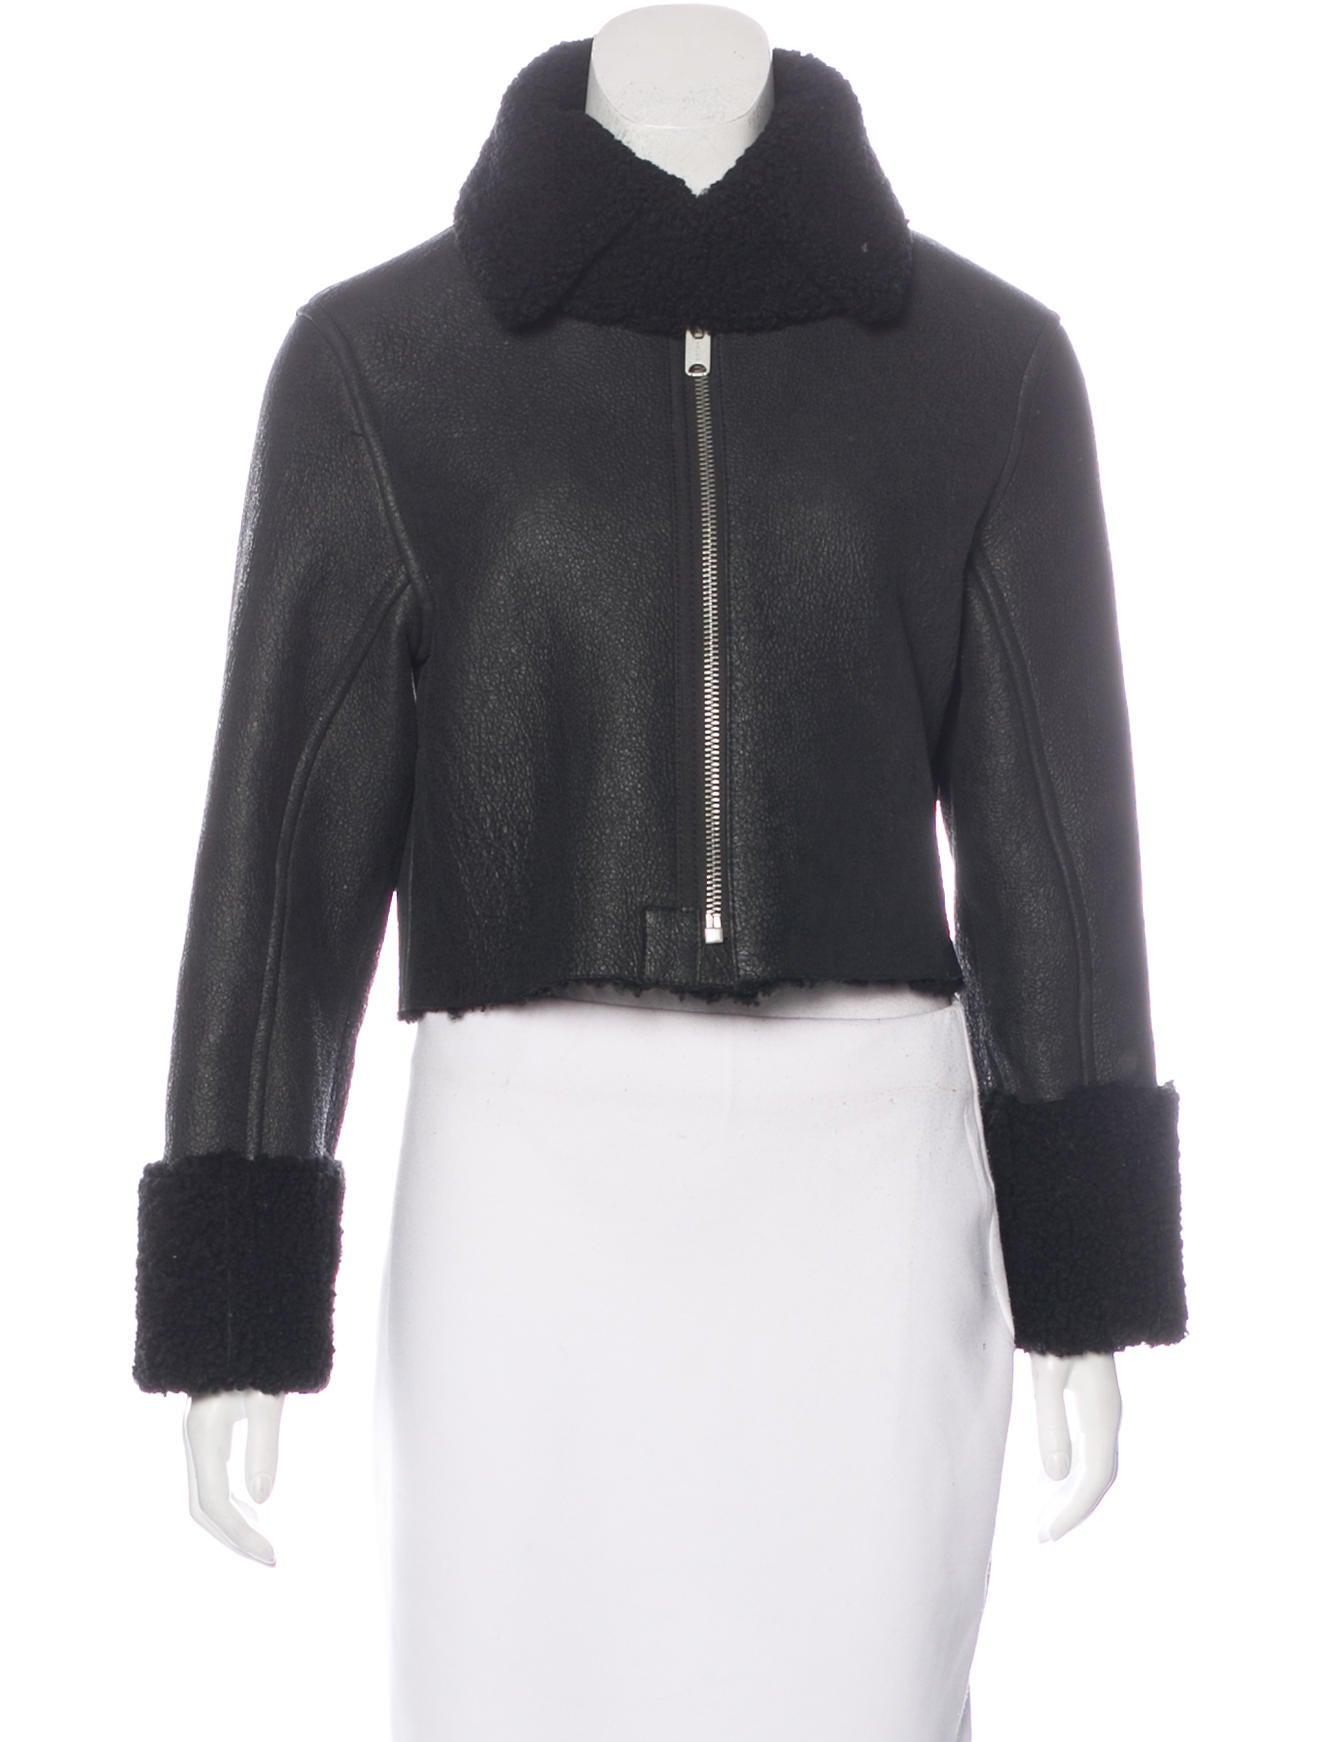 yeezy season 3 shearling jacket clothing wyeez20349. Black Bedroom Furniture Sets. Home Design Ideas